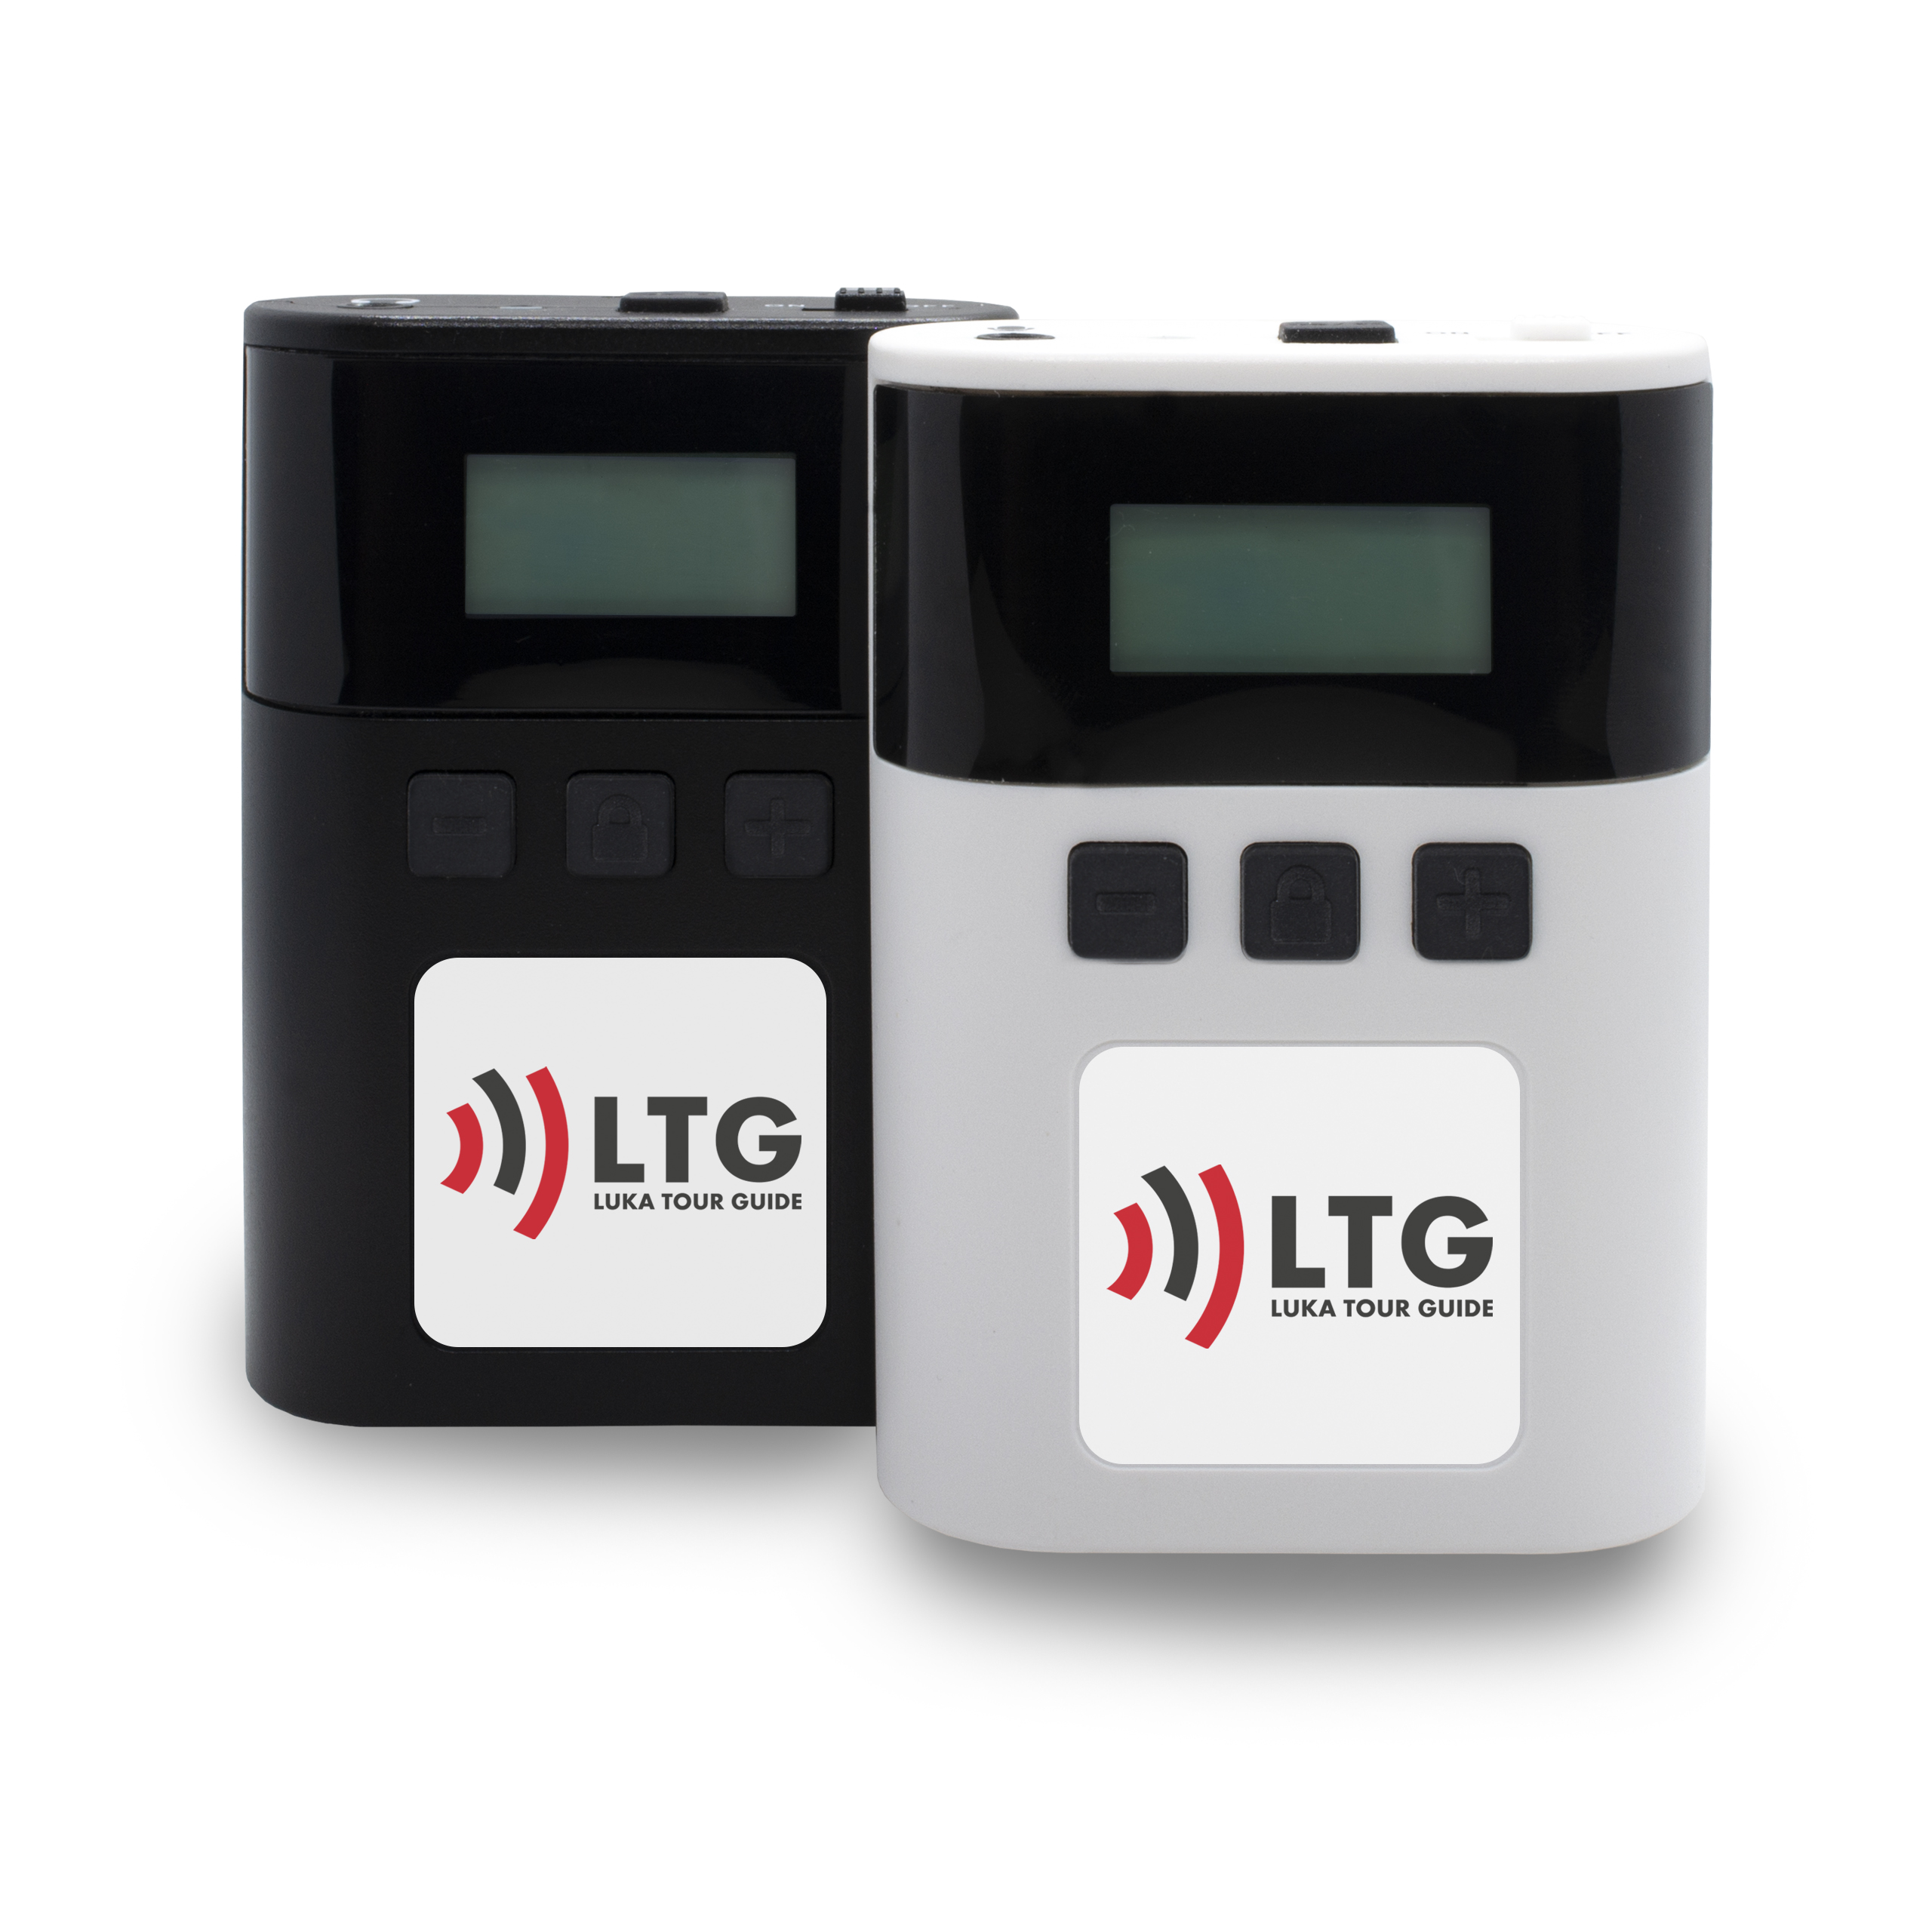 LTG S- 200 Pro